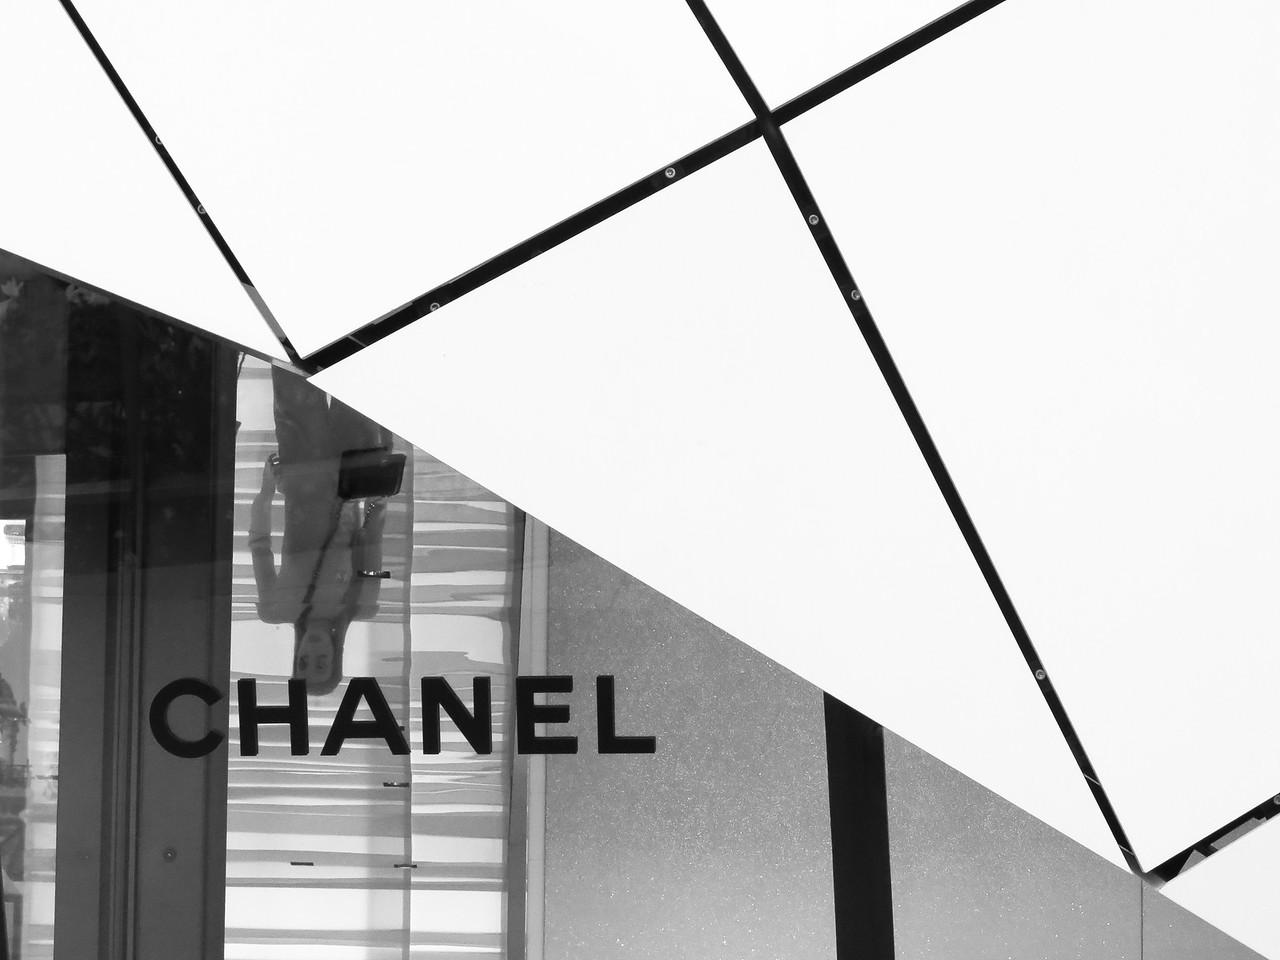 Chanel, The Monte Carlo Pavillions, Cercle d'Or, Monaco